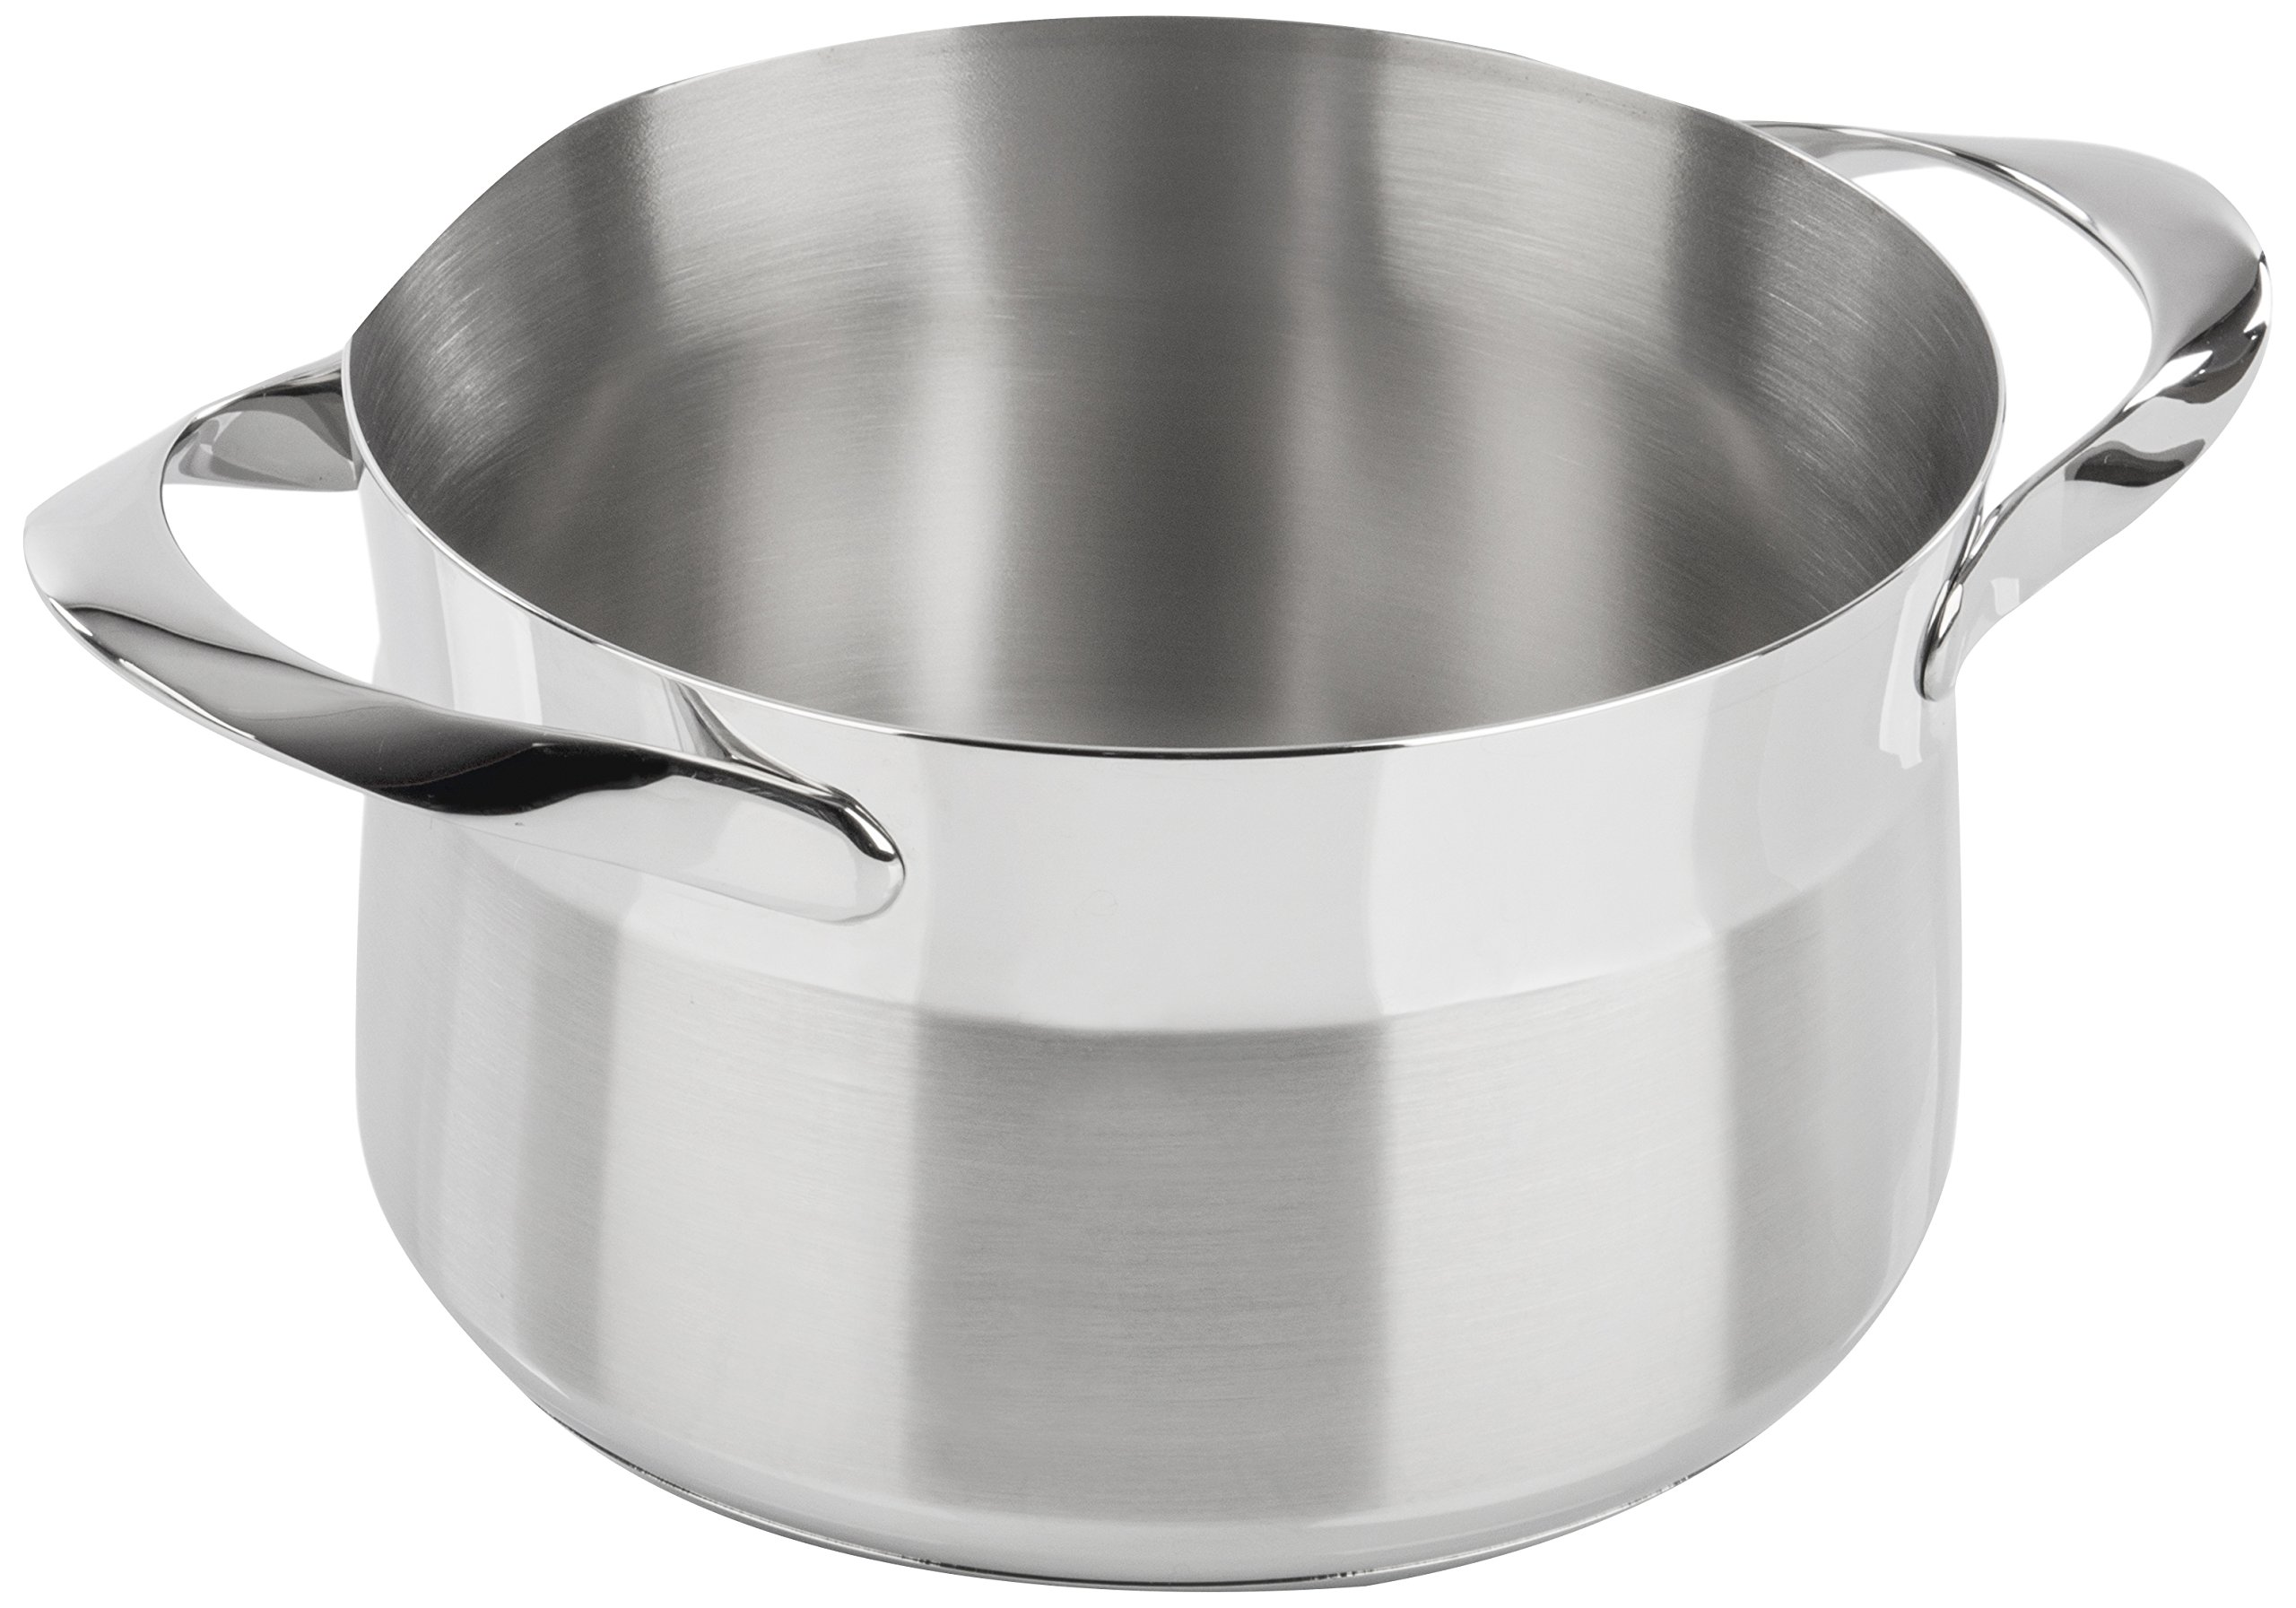 Barazzoni My Lady casserole stainless steel (24)